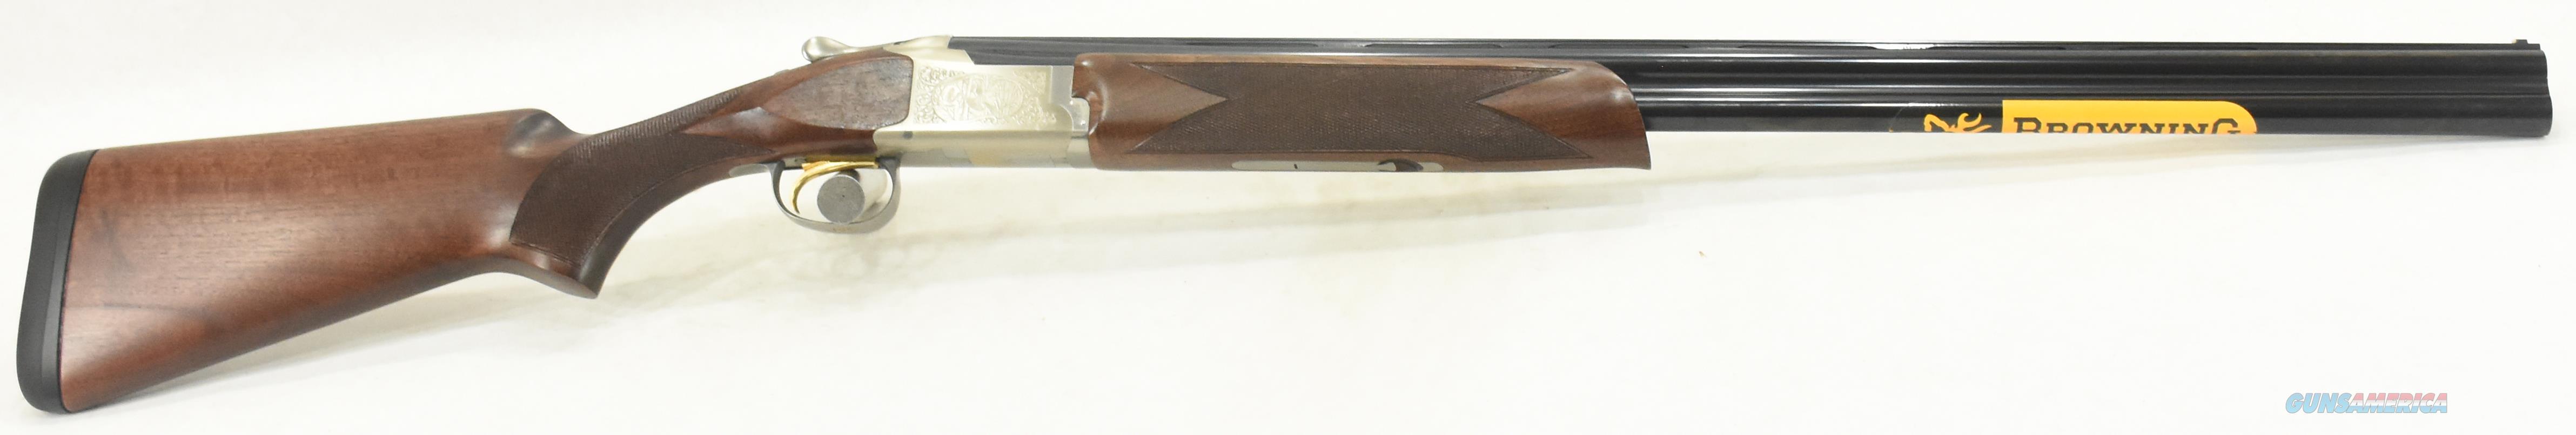 Citori 725 Feather Walnut 20Ga 28-3In 0135666004  Guns > Shotguns > Browning Shotguns > Over Unders > Citori > Hunting